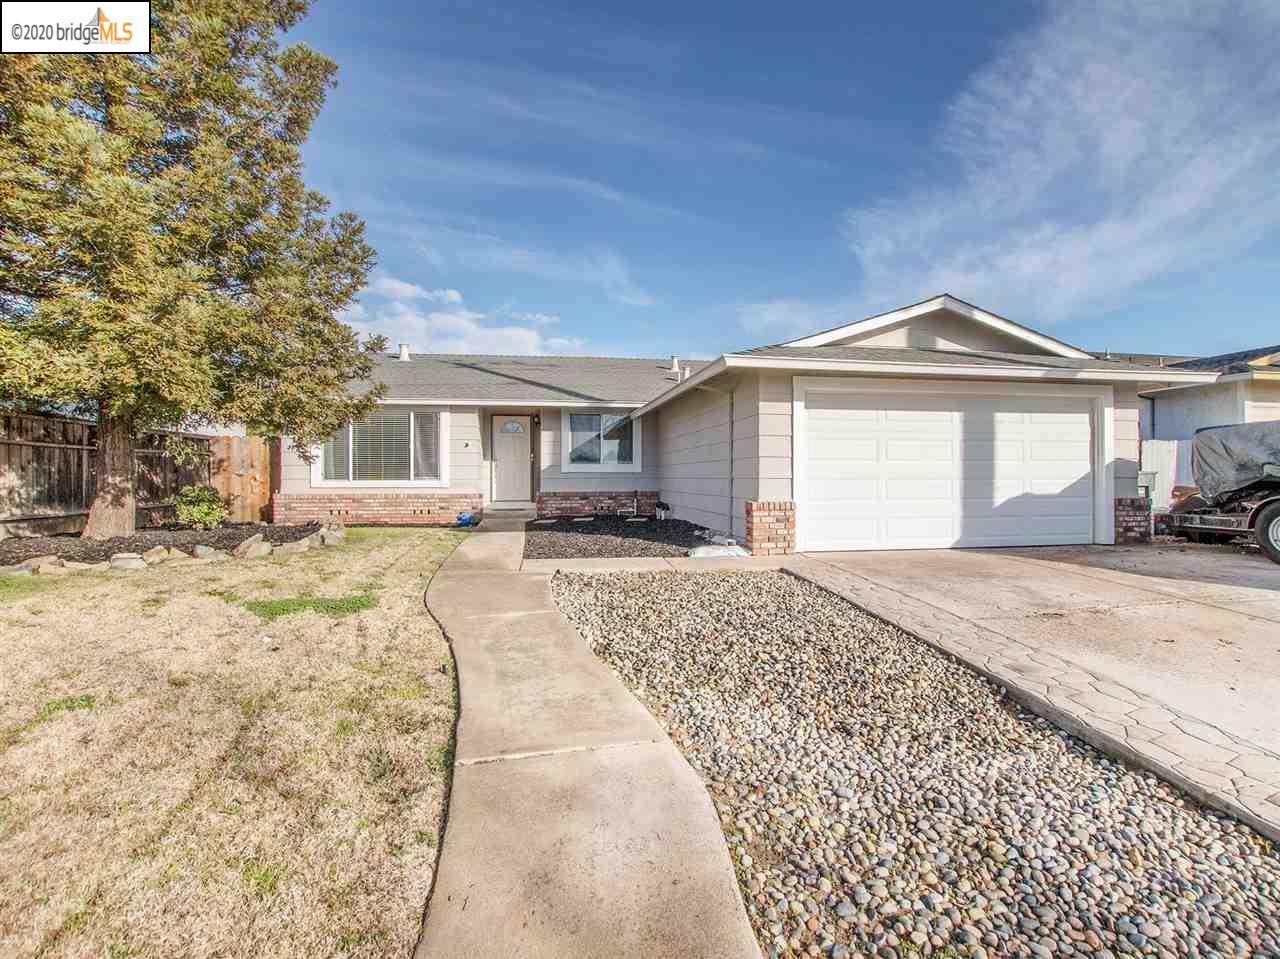 968 W Cypress Rd, OAKLEY, CA 94561